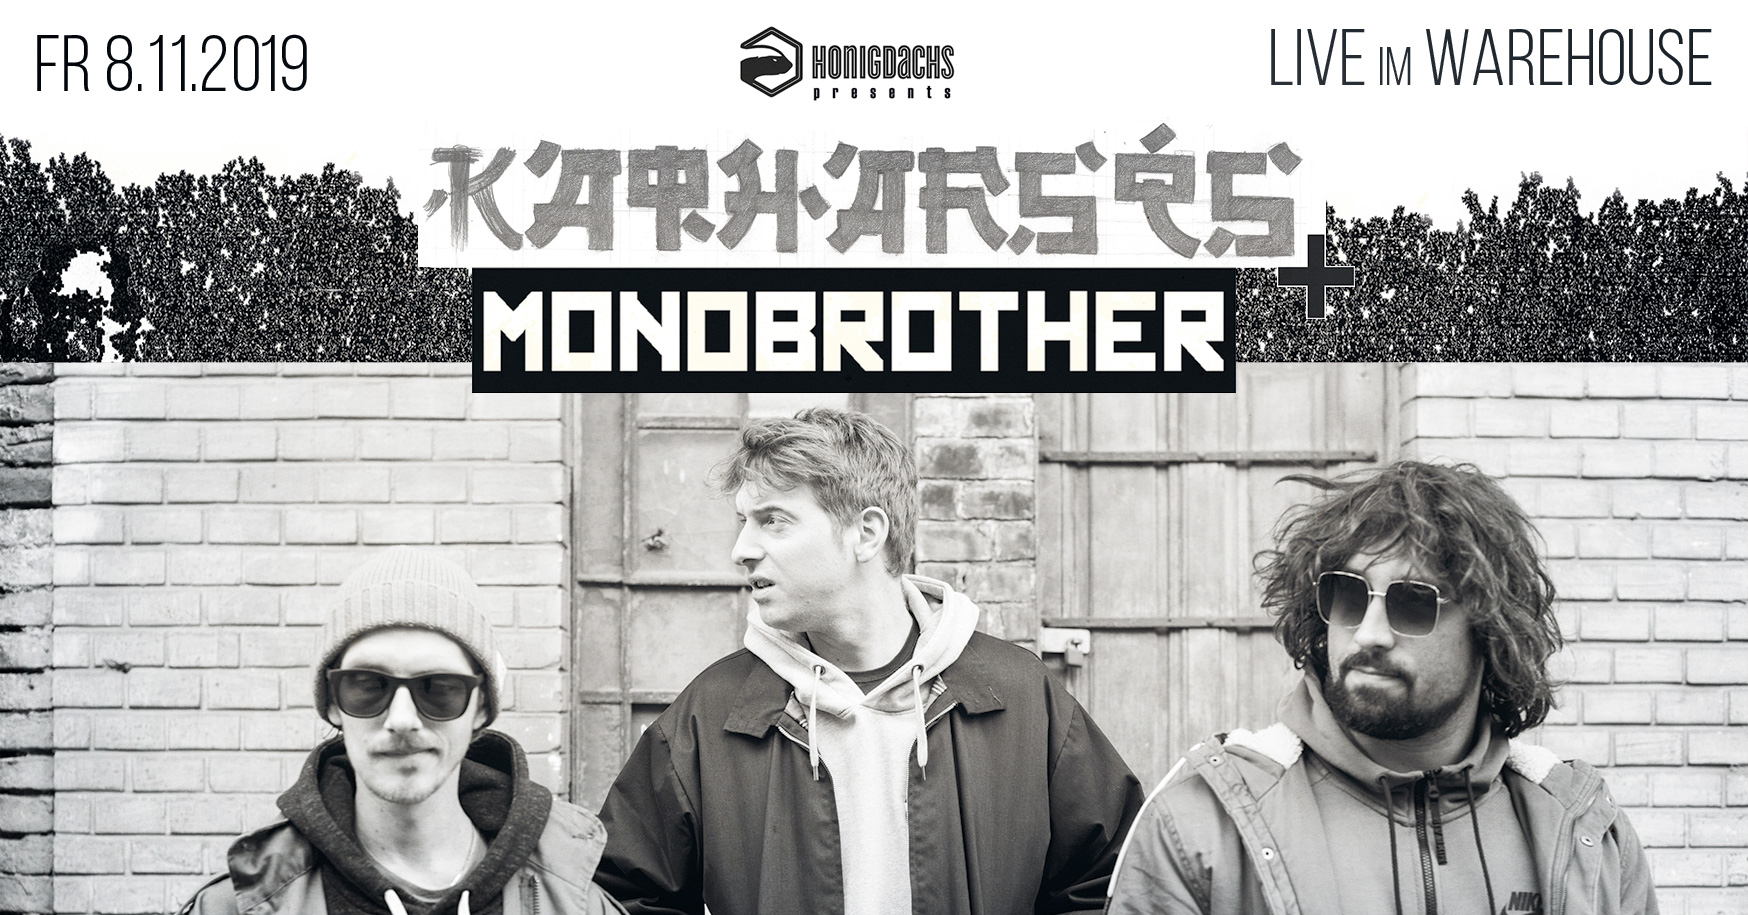 Monobrother & Katharsis (DRK&DiggaMindz) *LIVE